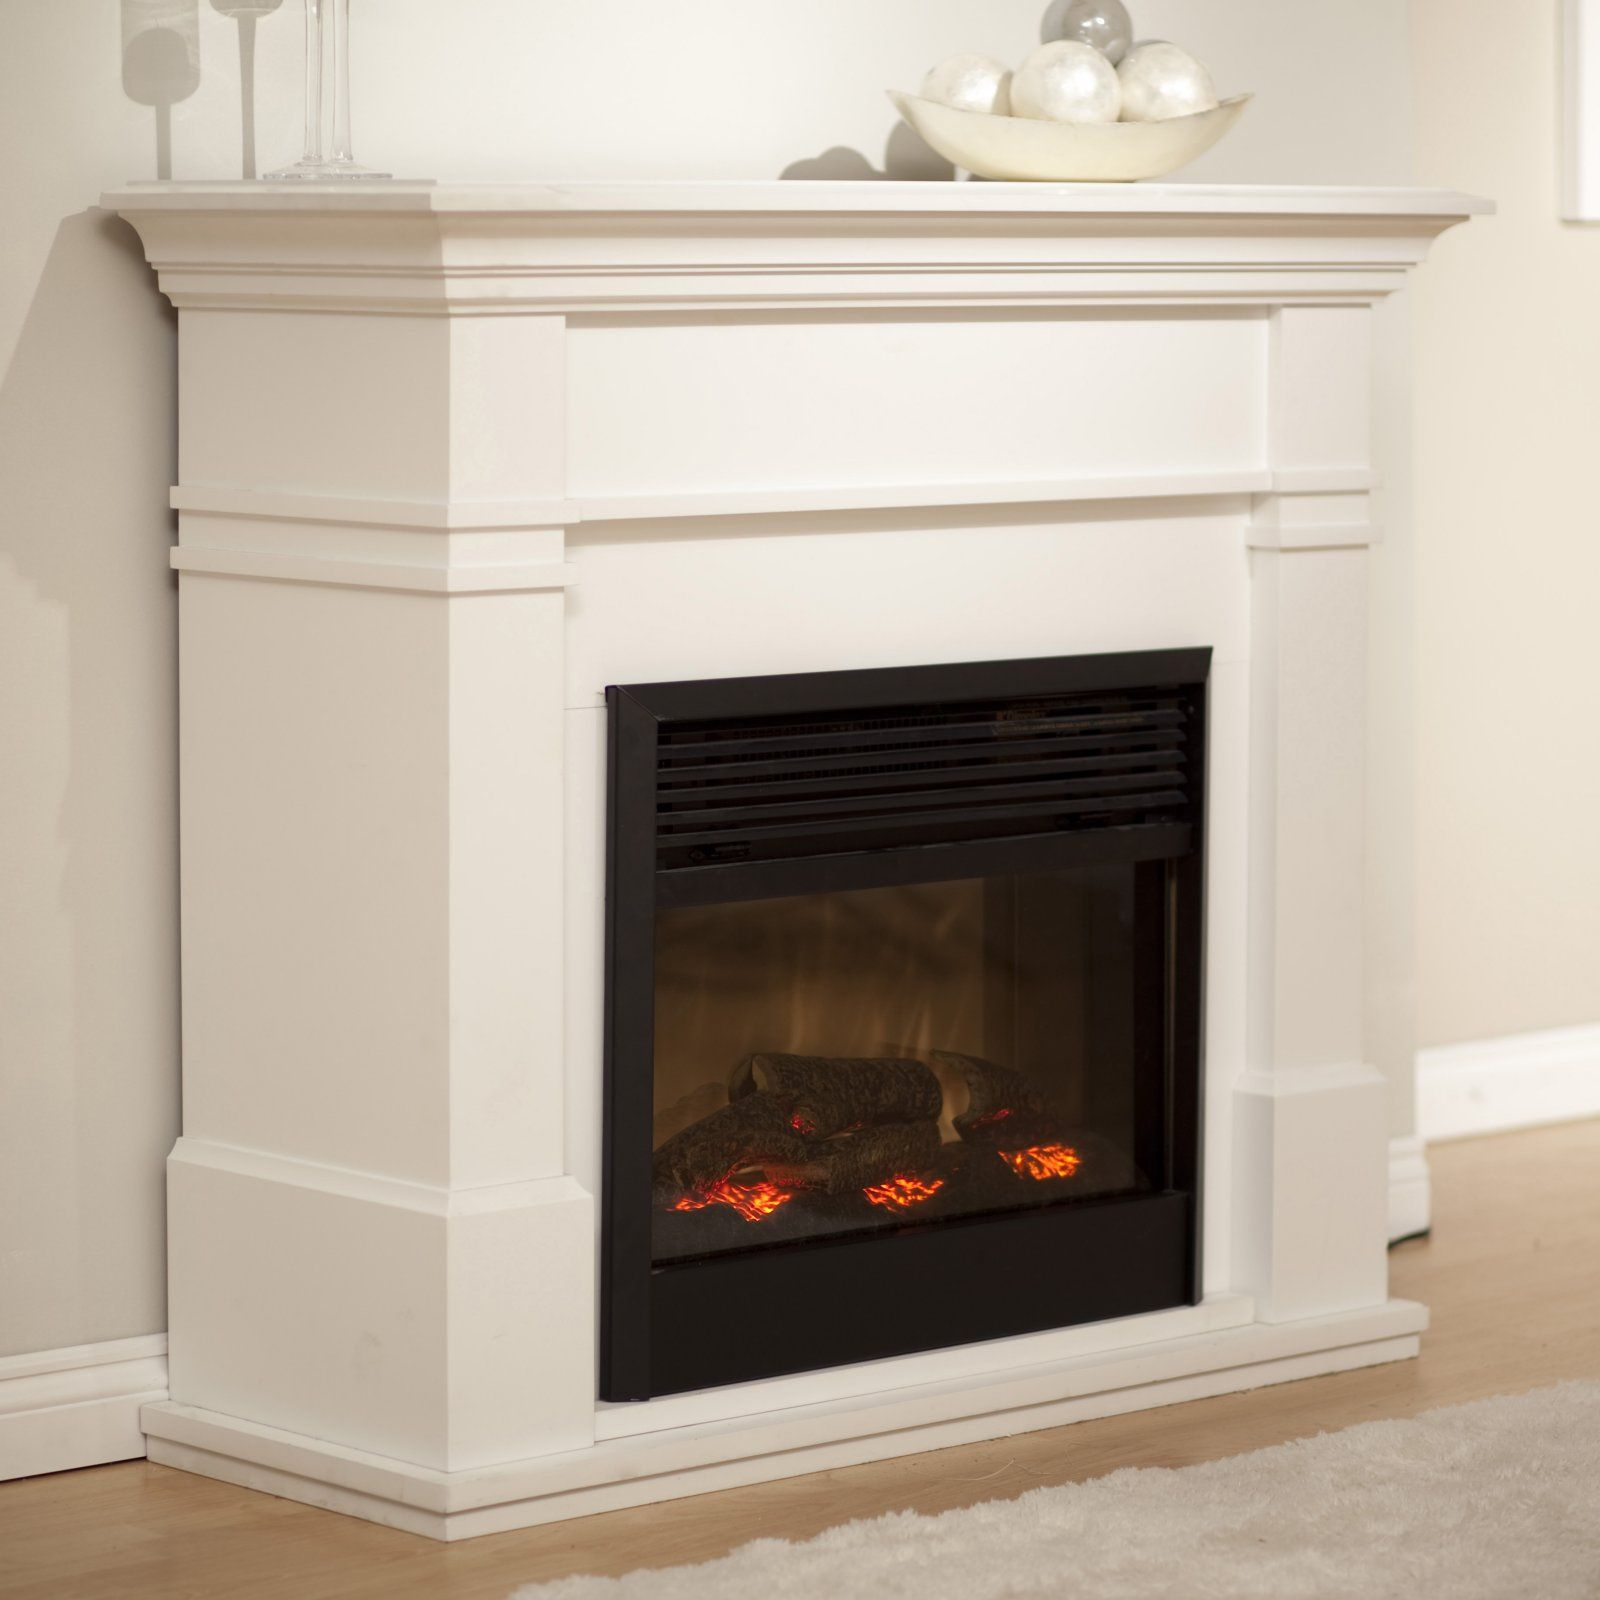 Dimplex Kenton White Electric Fireplace White Electric Fireplace Free Standing Electric Fireplace Contemporary Electric Fireplace